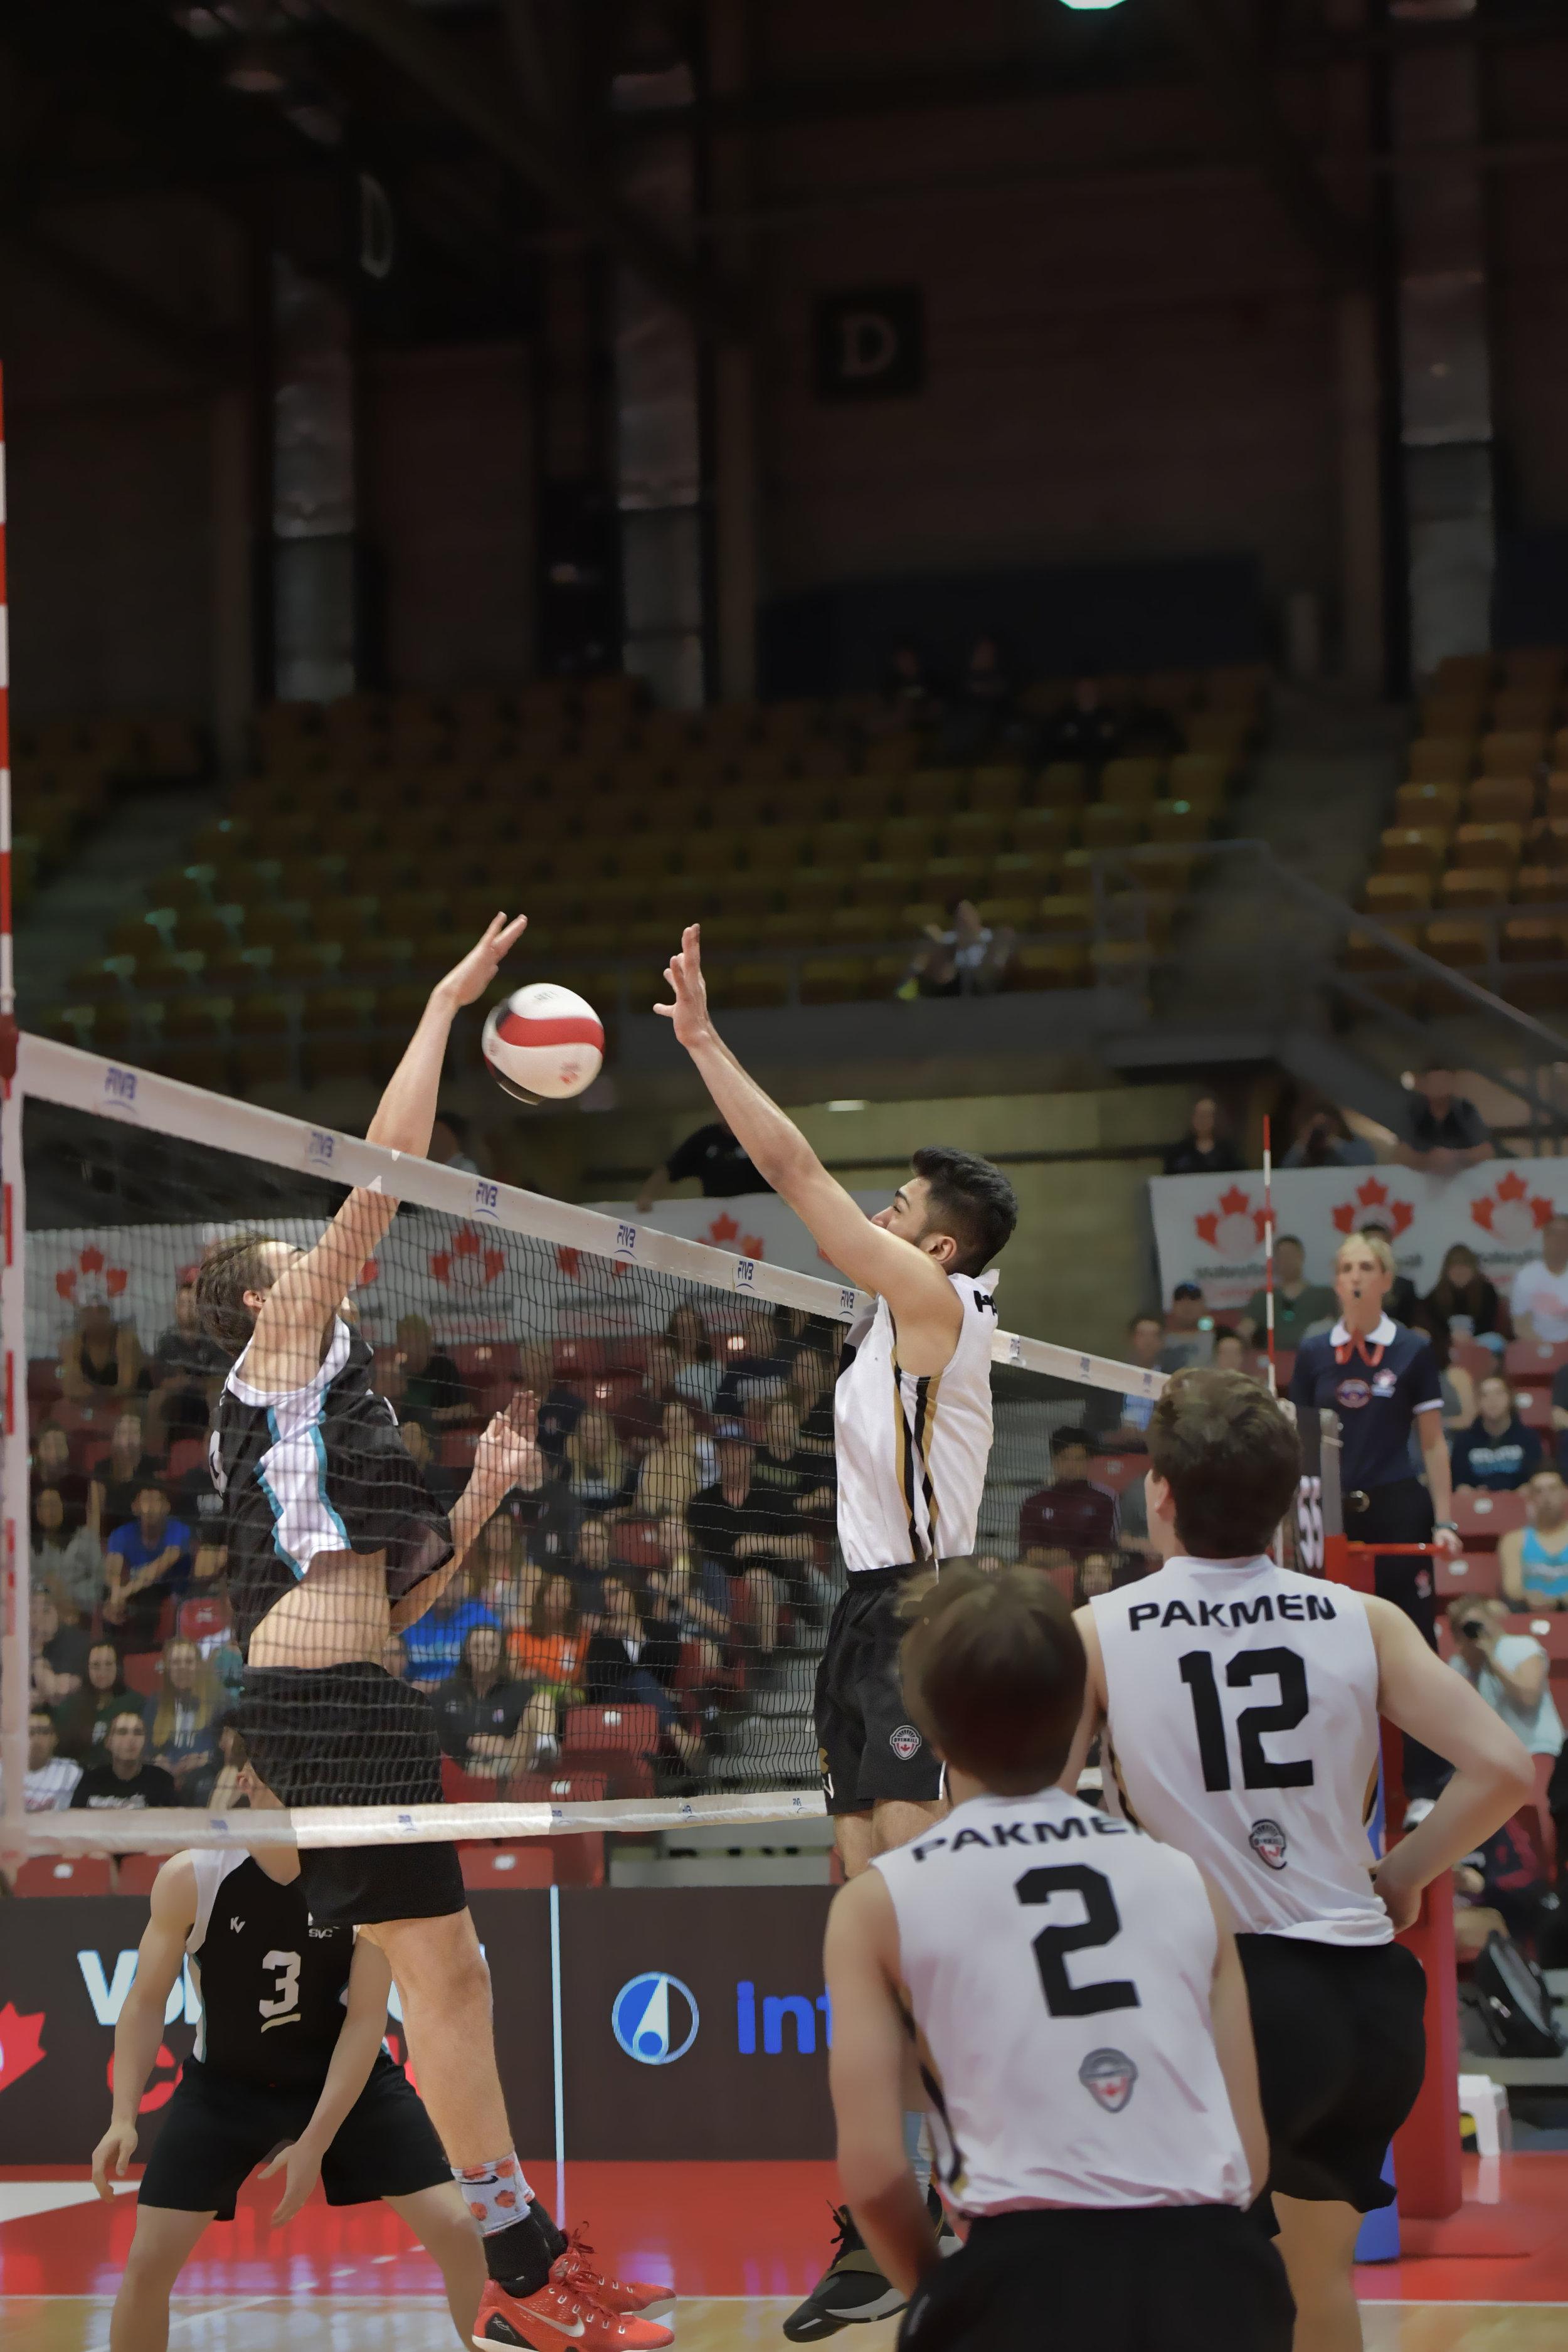 volleyballaction_4158.jpg